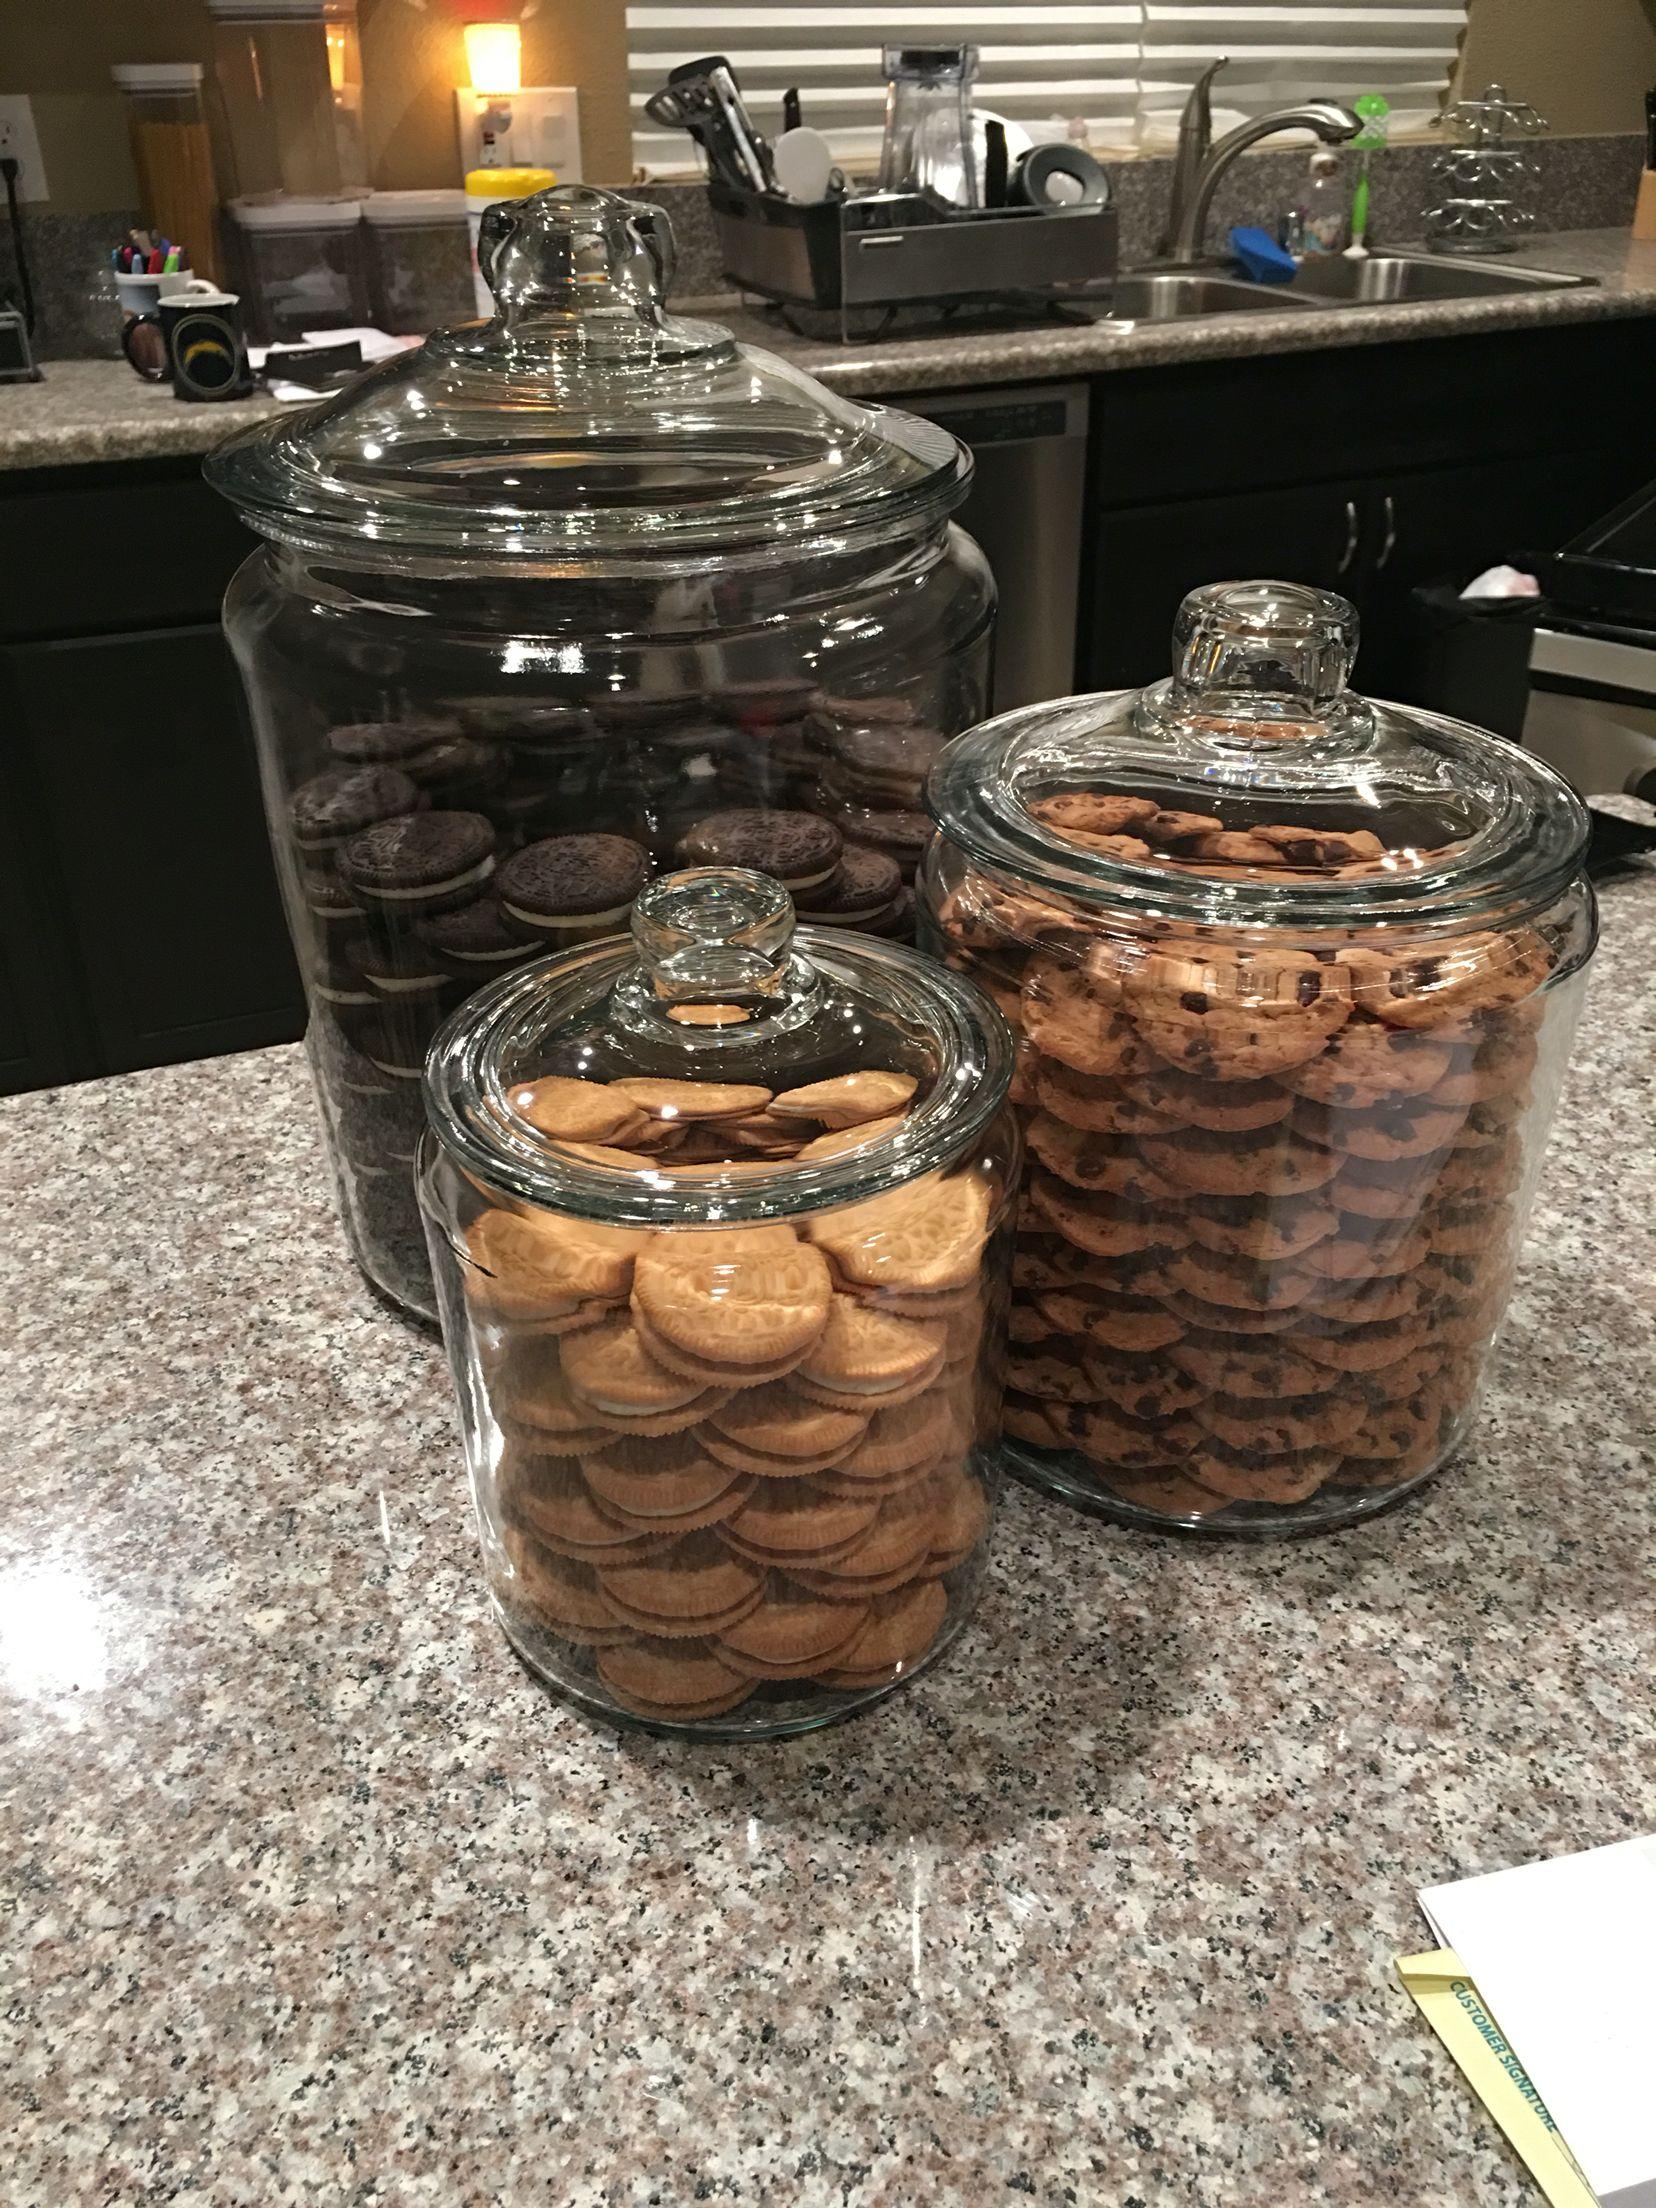 Khloe Kardashian's copy cat cookie jars